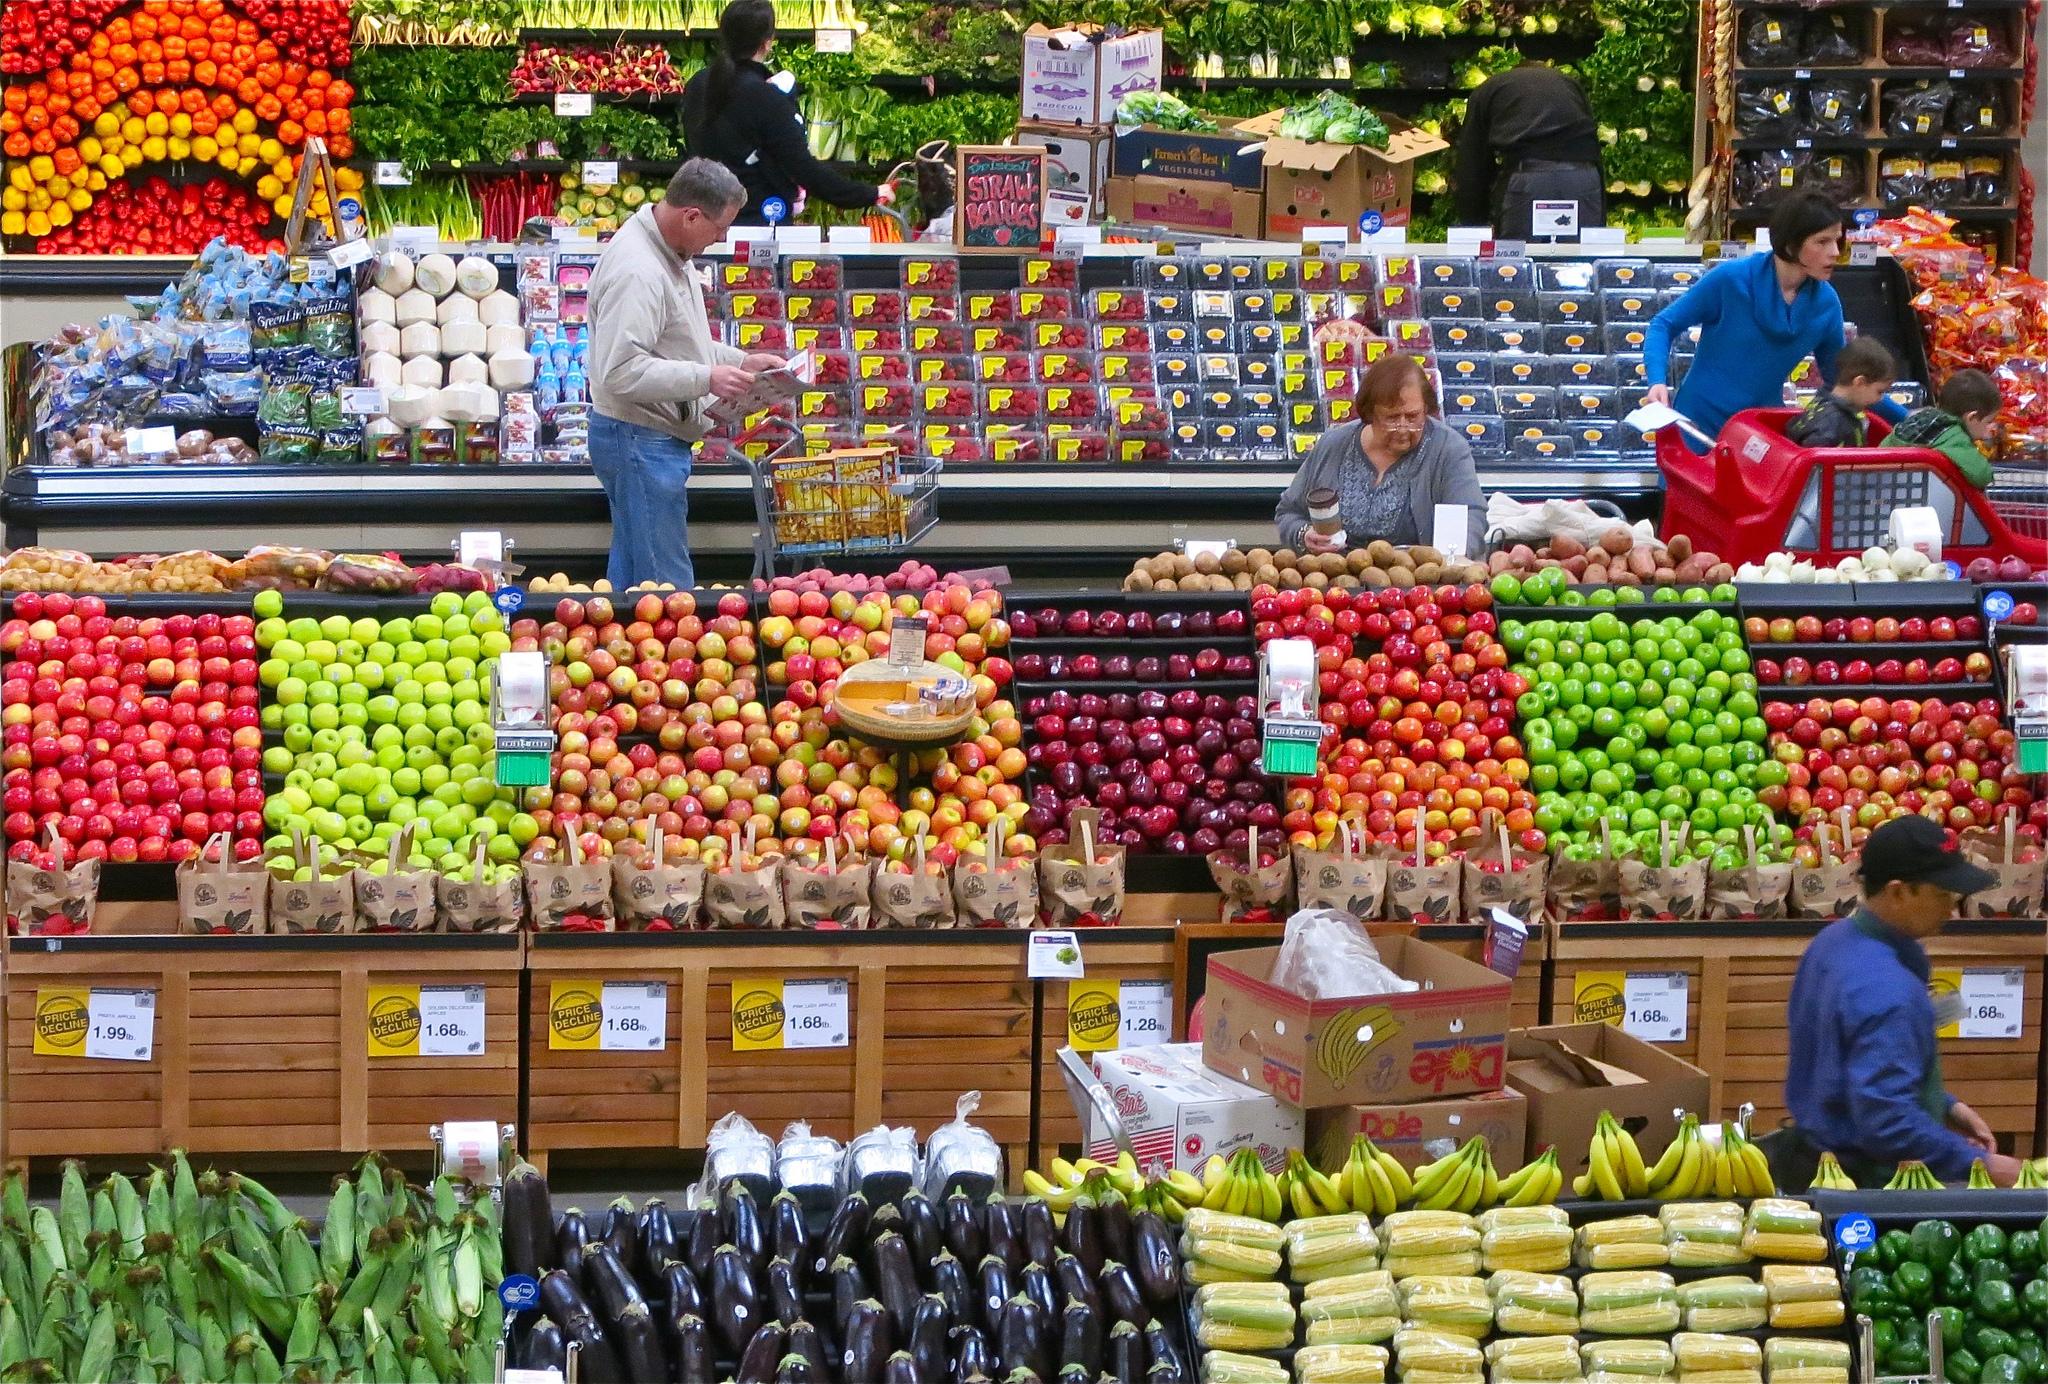 Walmart Whole Foods Market